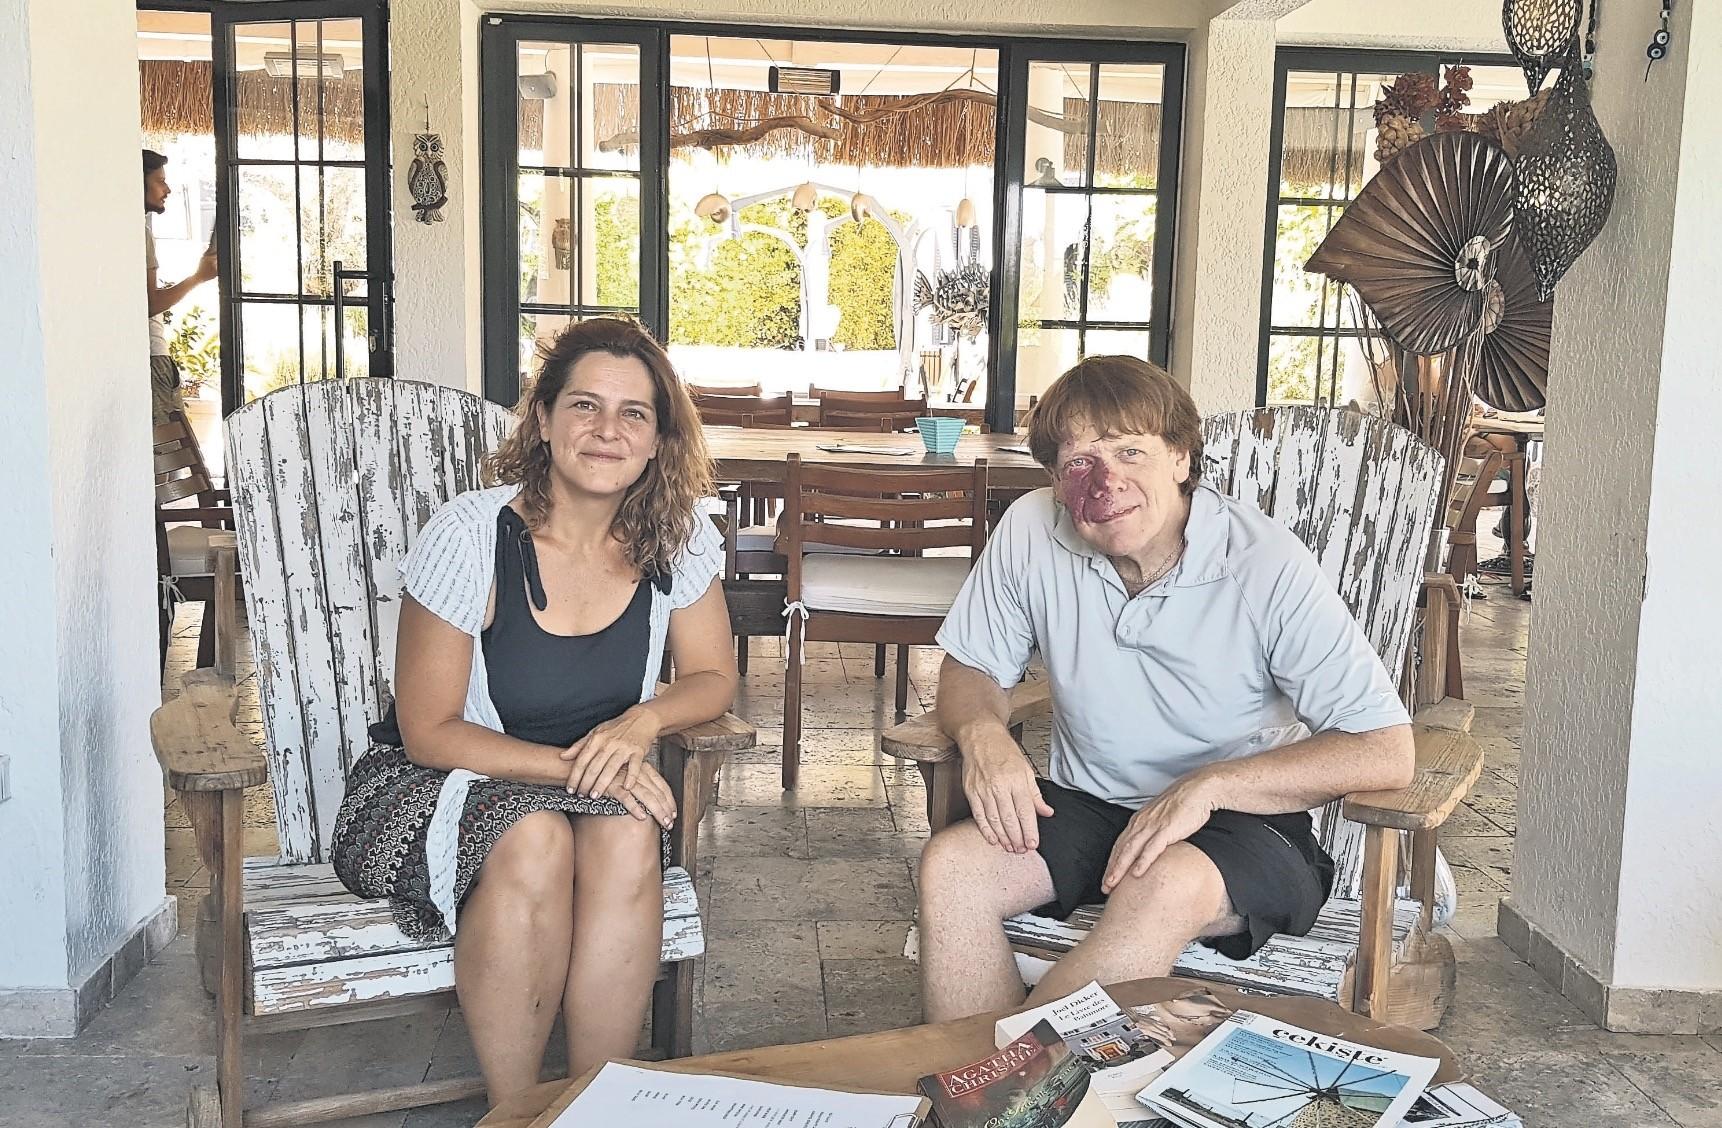 Daily Sabahu2019s Leyla Yvonne Ergil interviews saxophonist Ed Pithey.